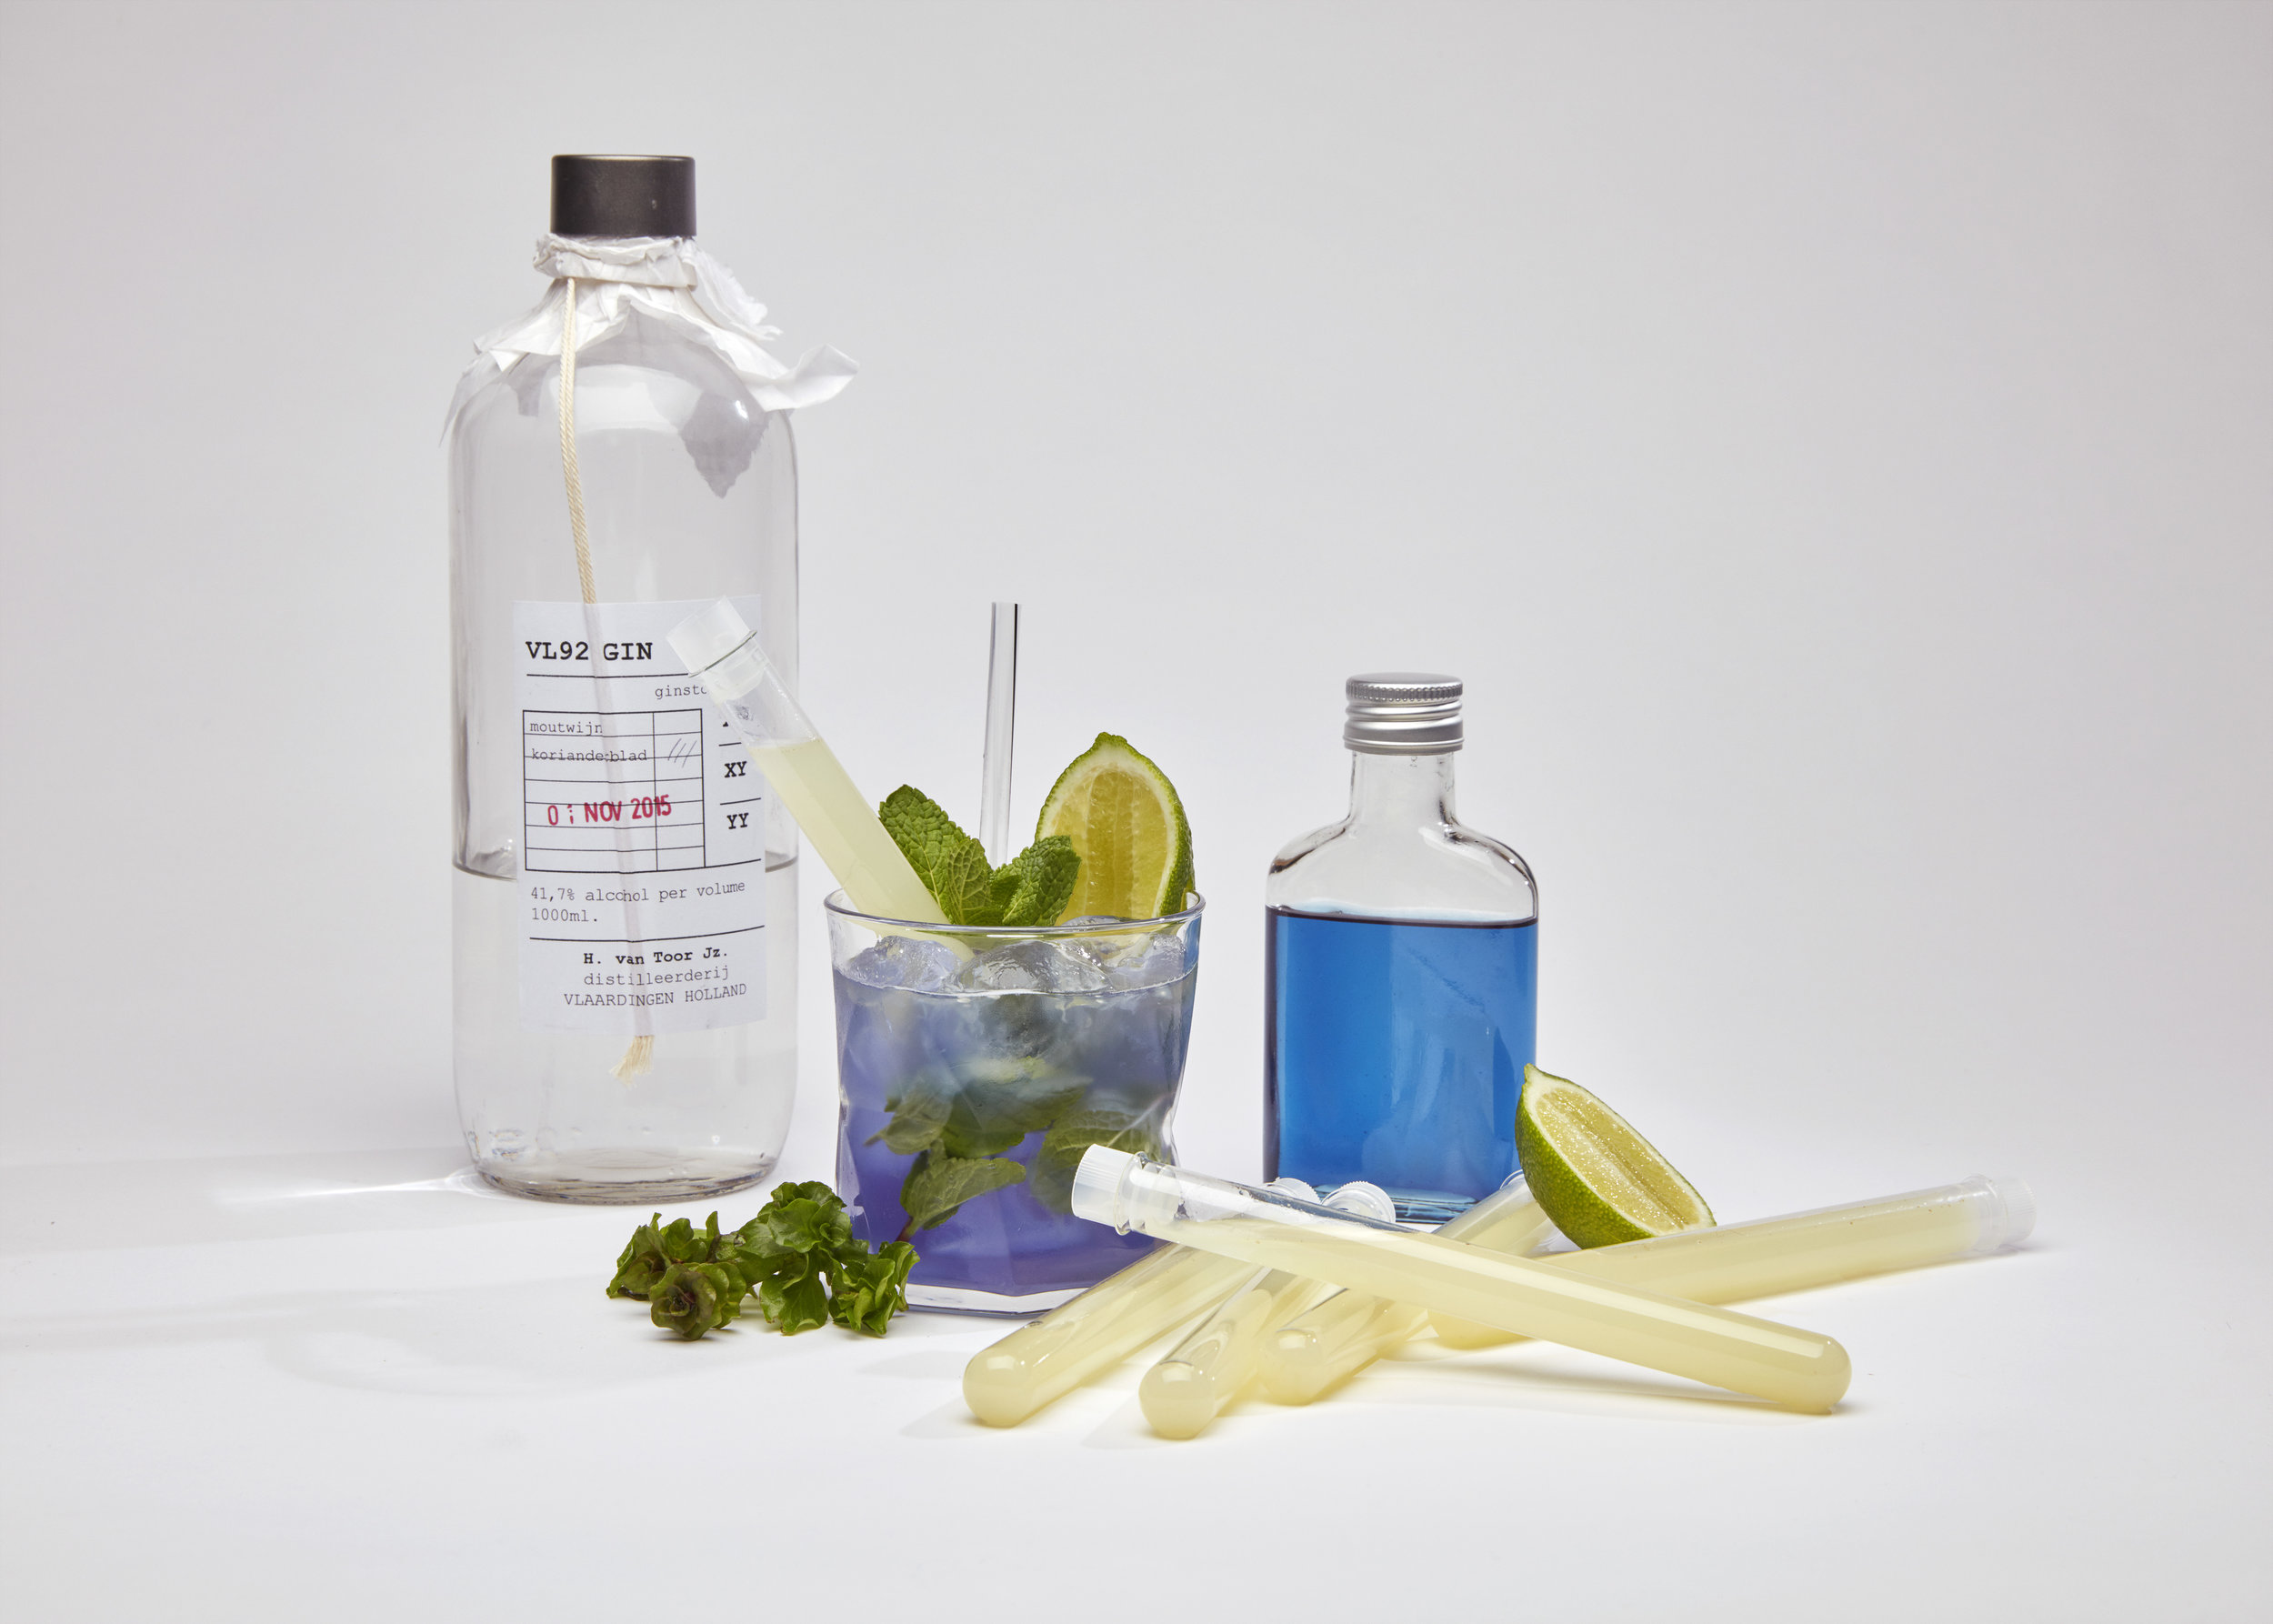 Ontwikkeling van de Blue Gin Fizz. Foto: Mathilde Karrèr Photography